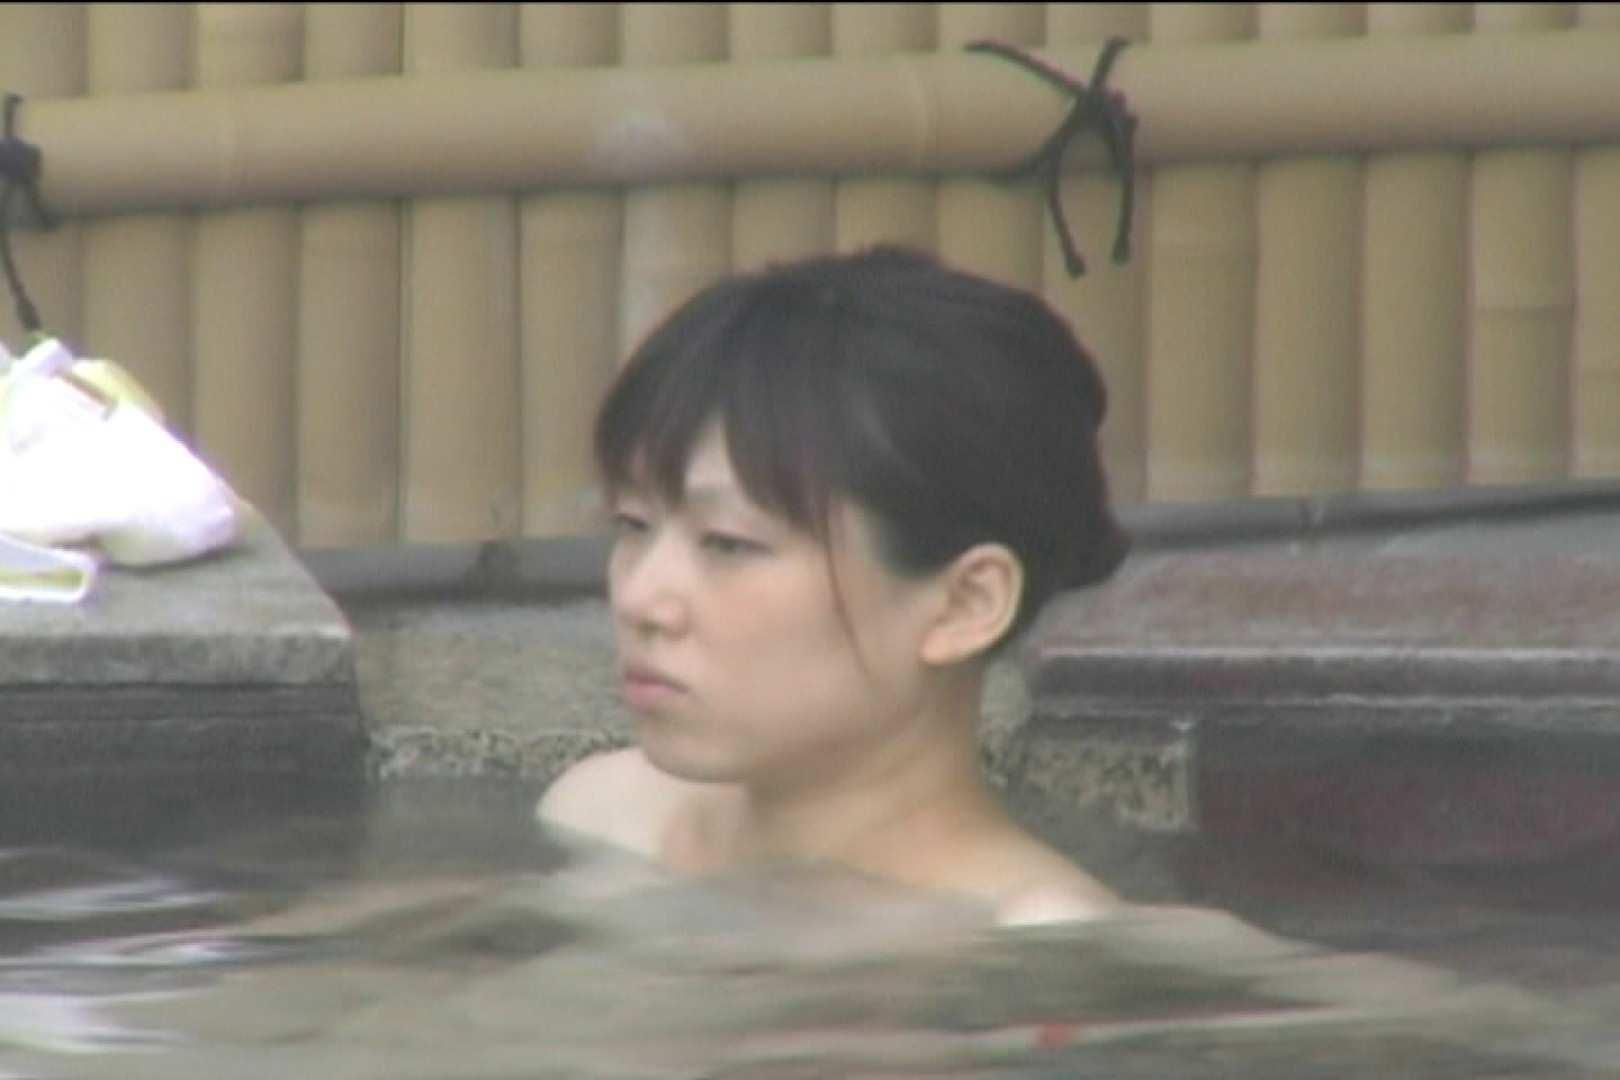 Aquaな露天風呂Vol.121 露天風呂編  82PIX 40